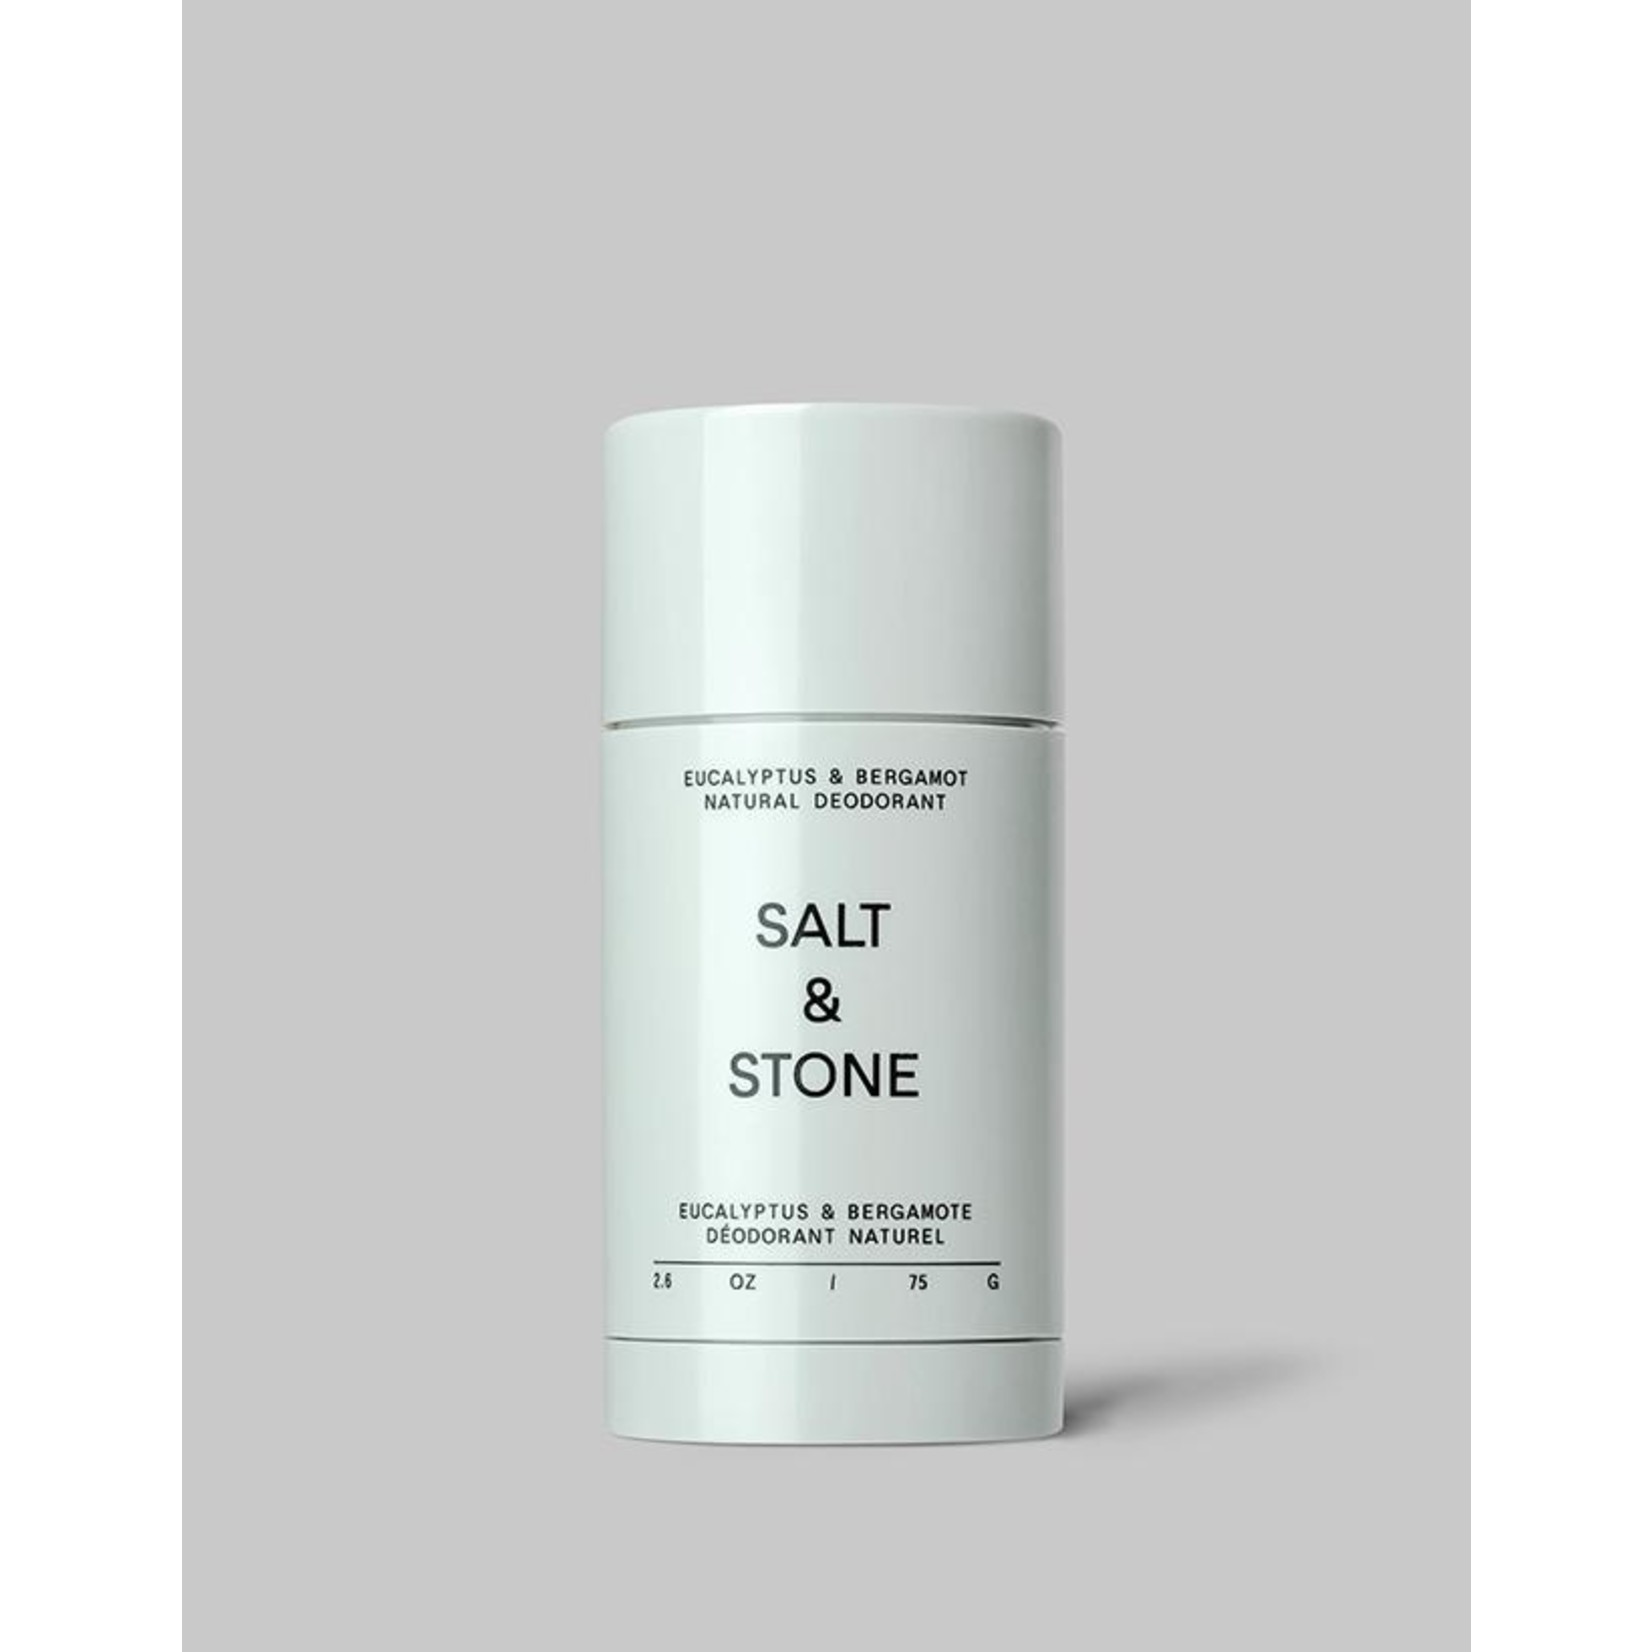 SALT & STONE DEODORANT EUCALYPTUS & BERGAMOT - NATURAL DEODORANT (SENSITIVE SKIN)